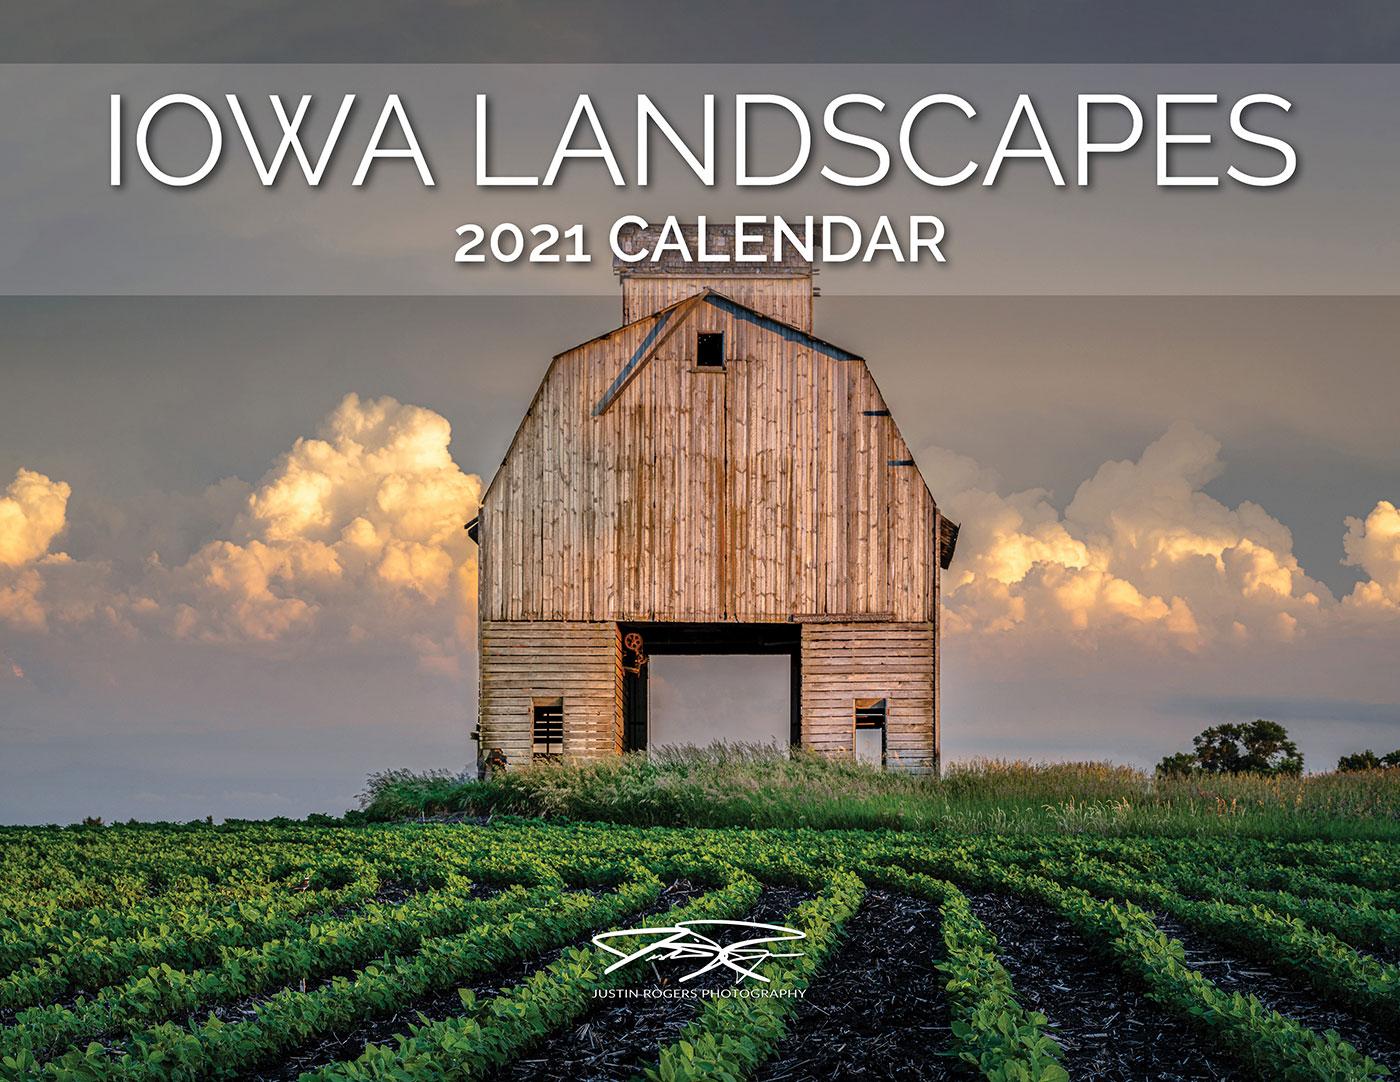 2021 Calendar: Iowa Landscapes